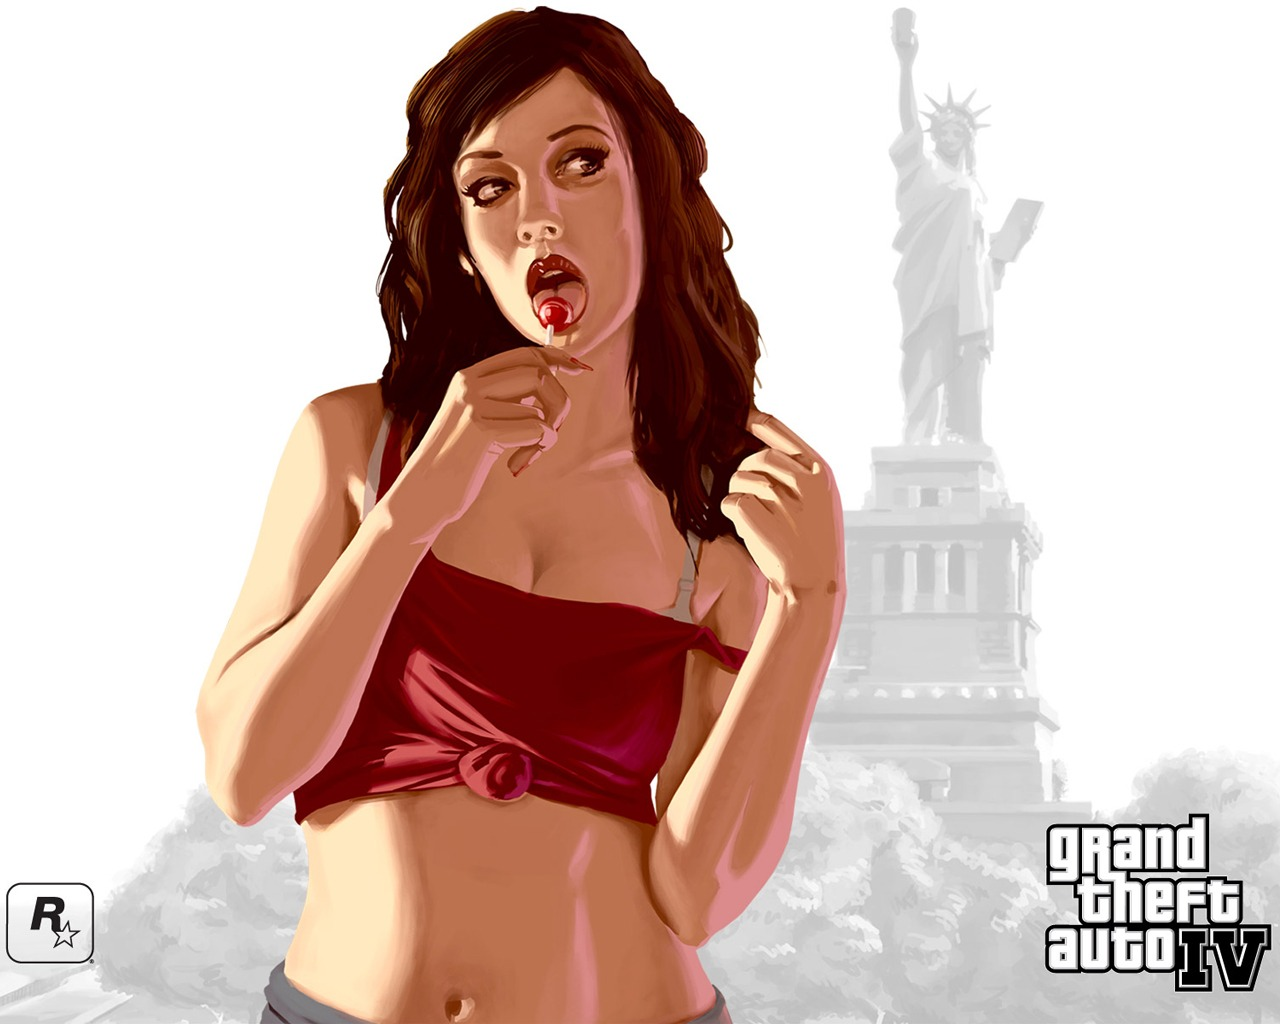 Grand Theft Auto Wallpaper Girl Gta 4 Girl Wallpaper Gta Iv Games Wallpapers In Jpg Format